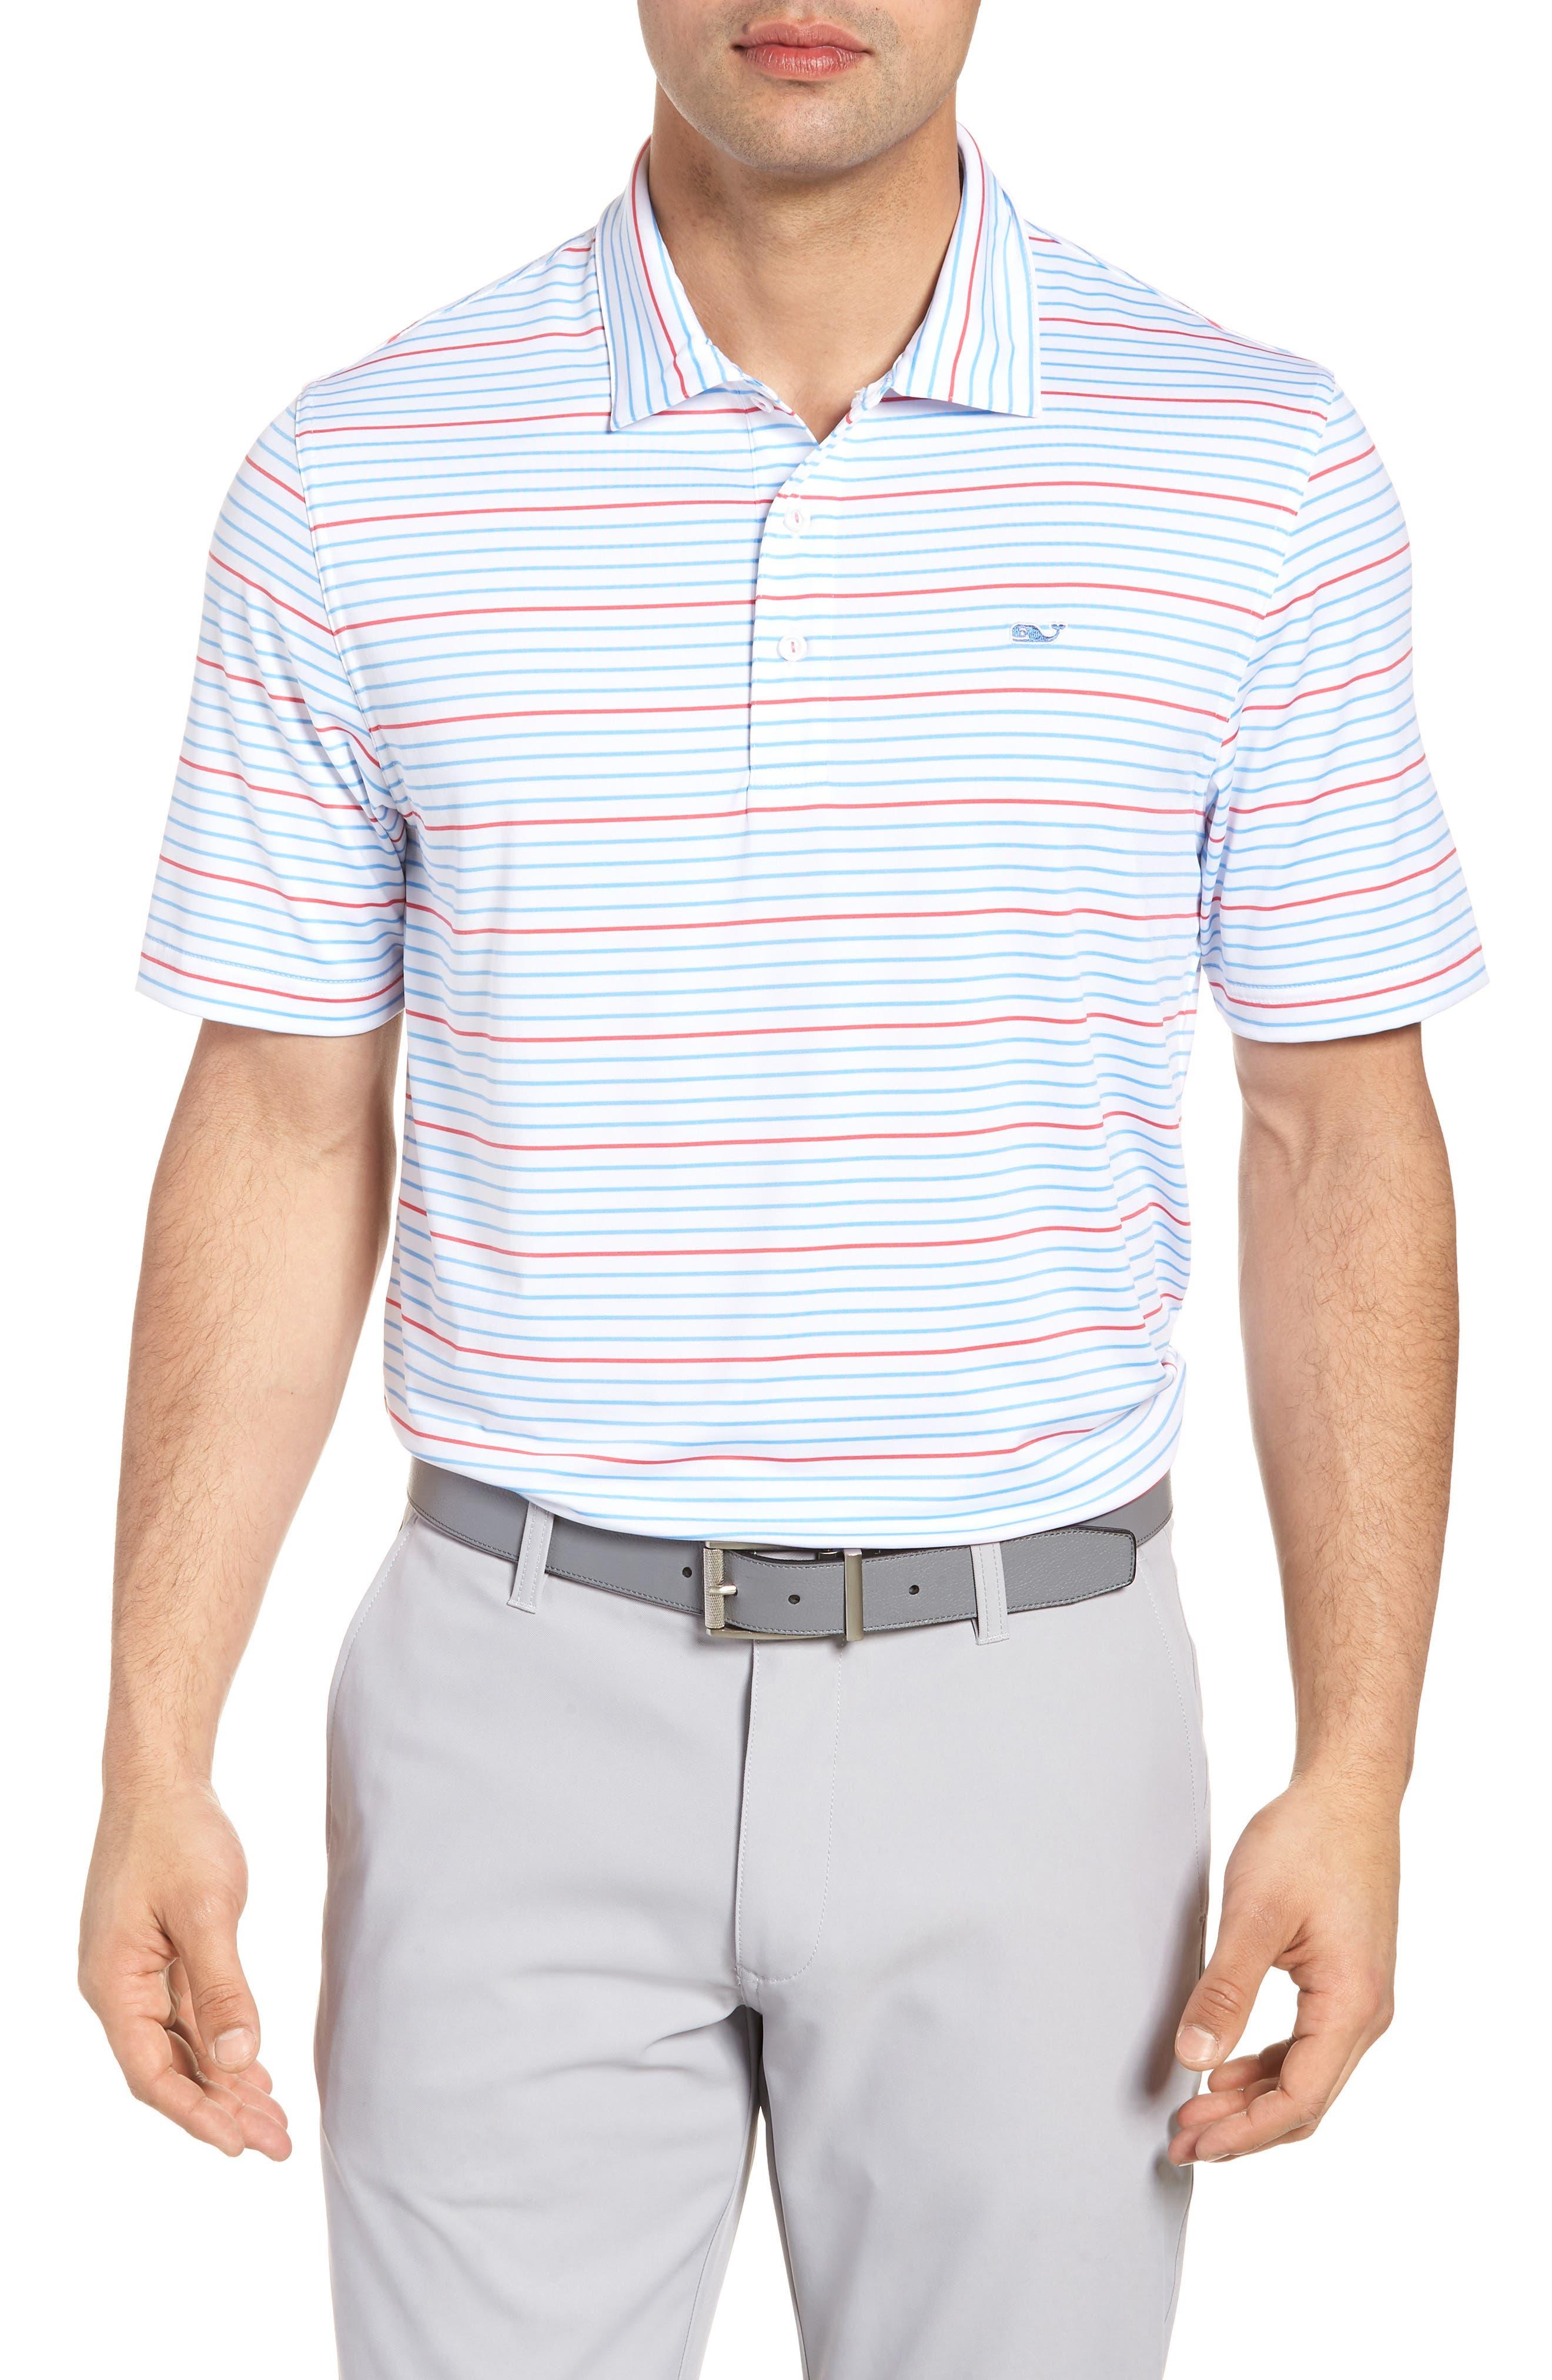 Swindell Stretch Stripe Polo,                             Main thumbnail 1, color,                             100